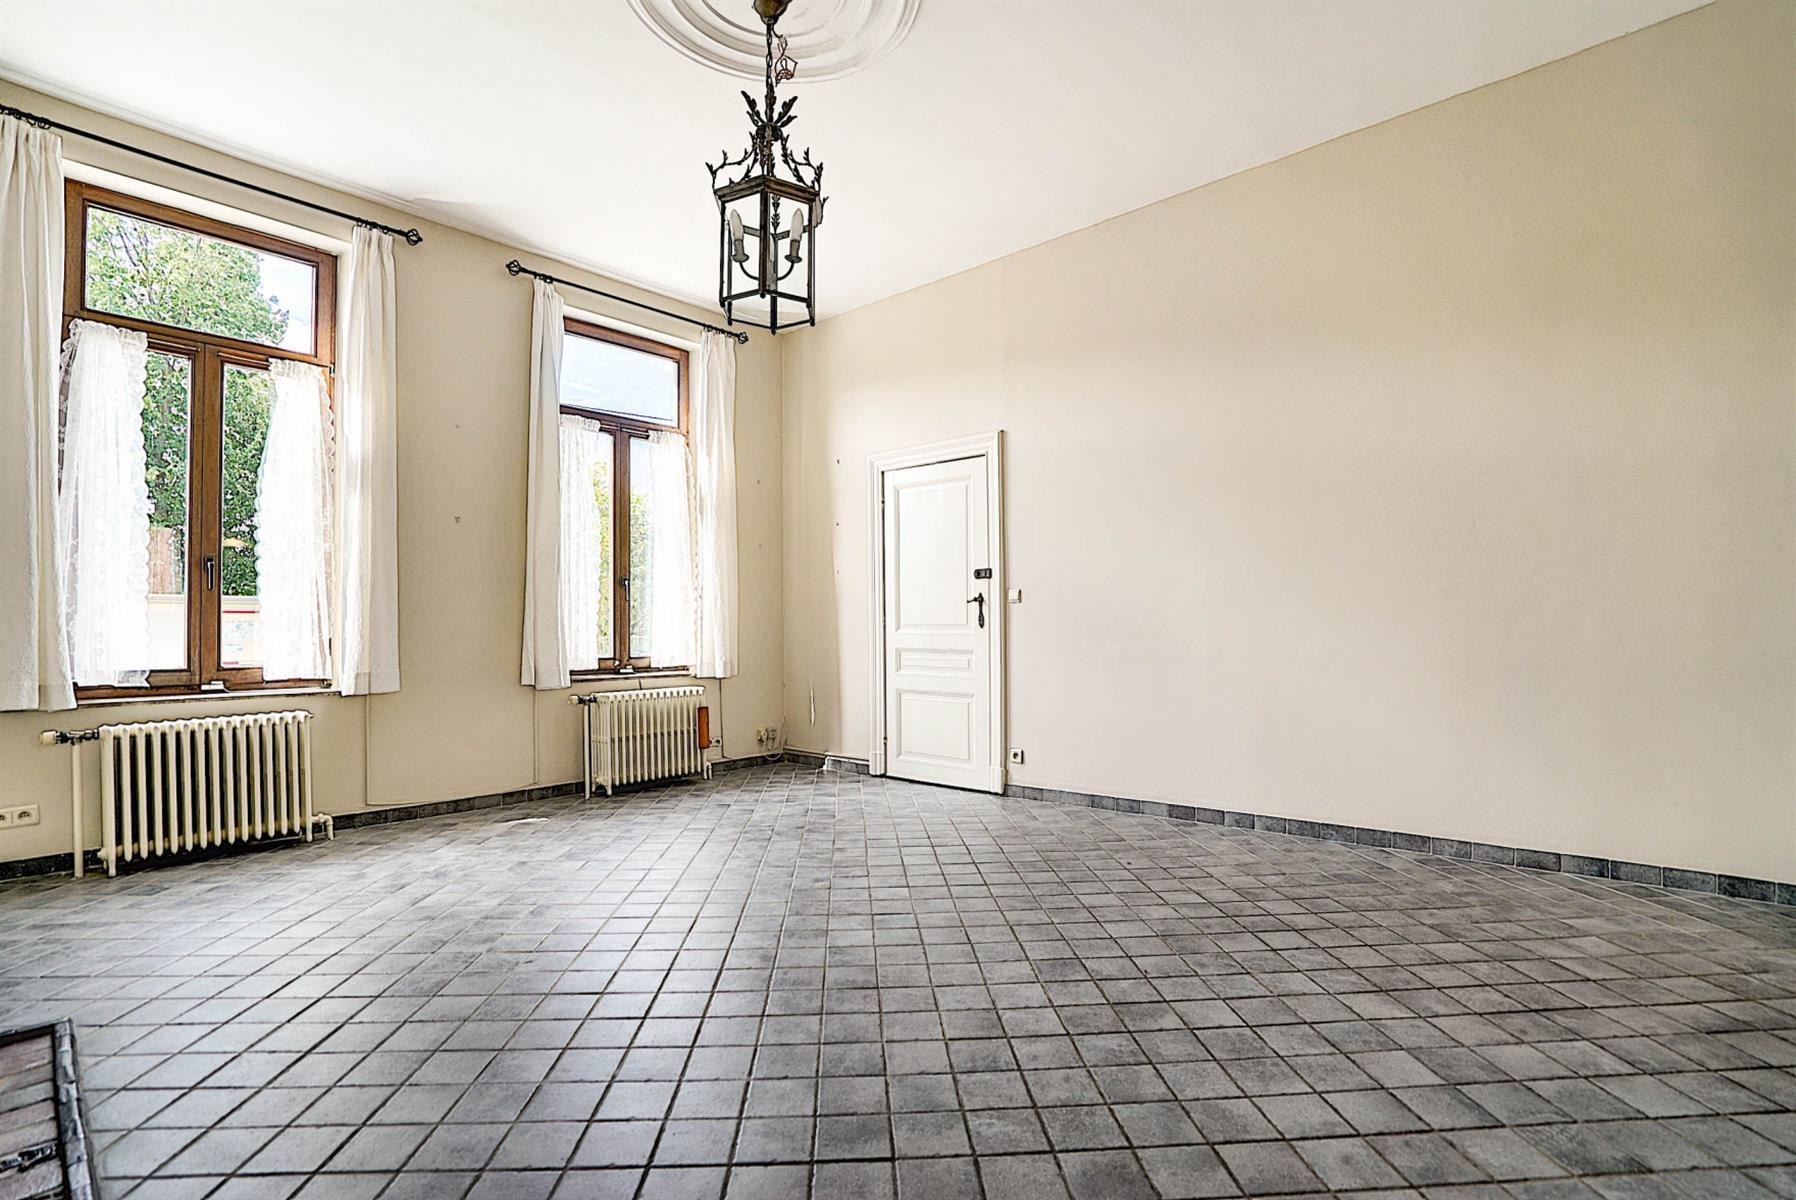 Maison - Bousval - #4131618-7